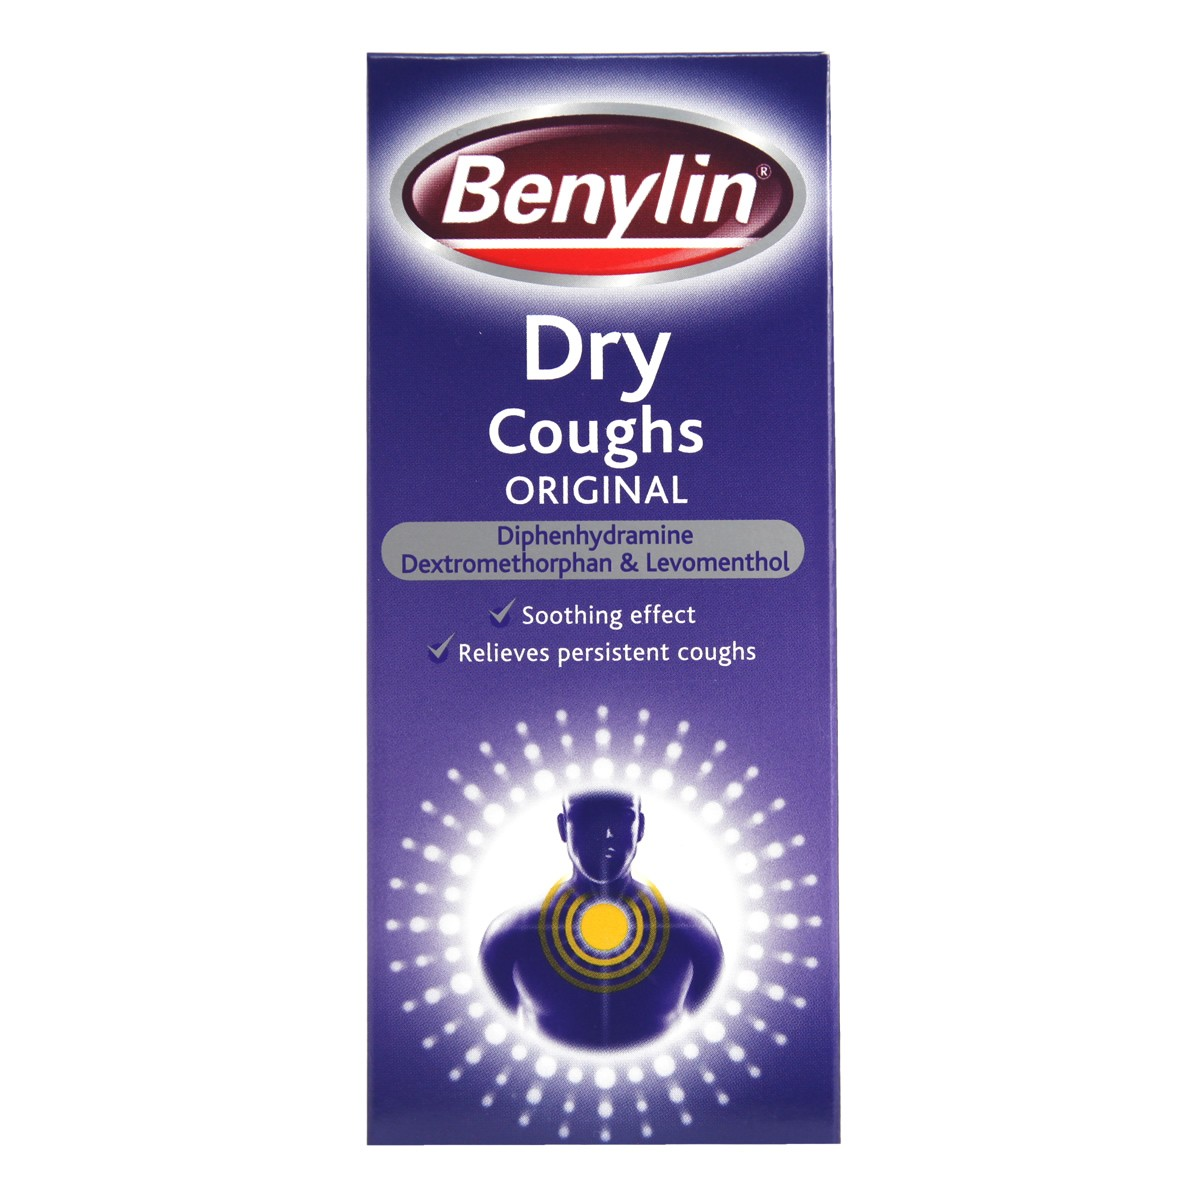 Benylin Dry Coughs Original